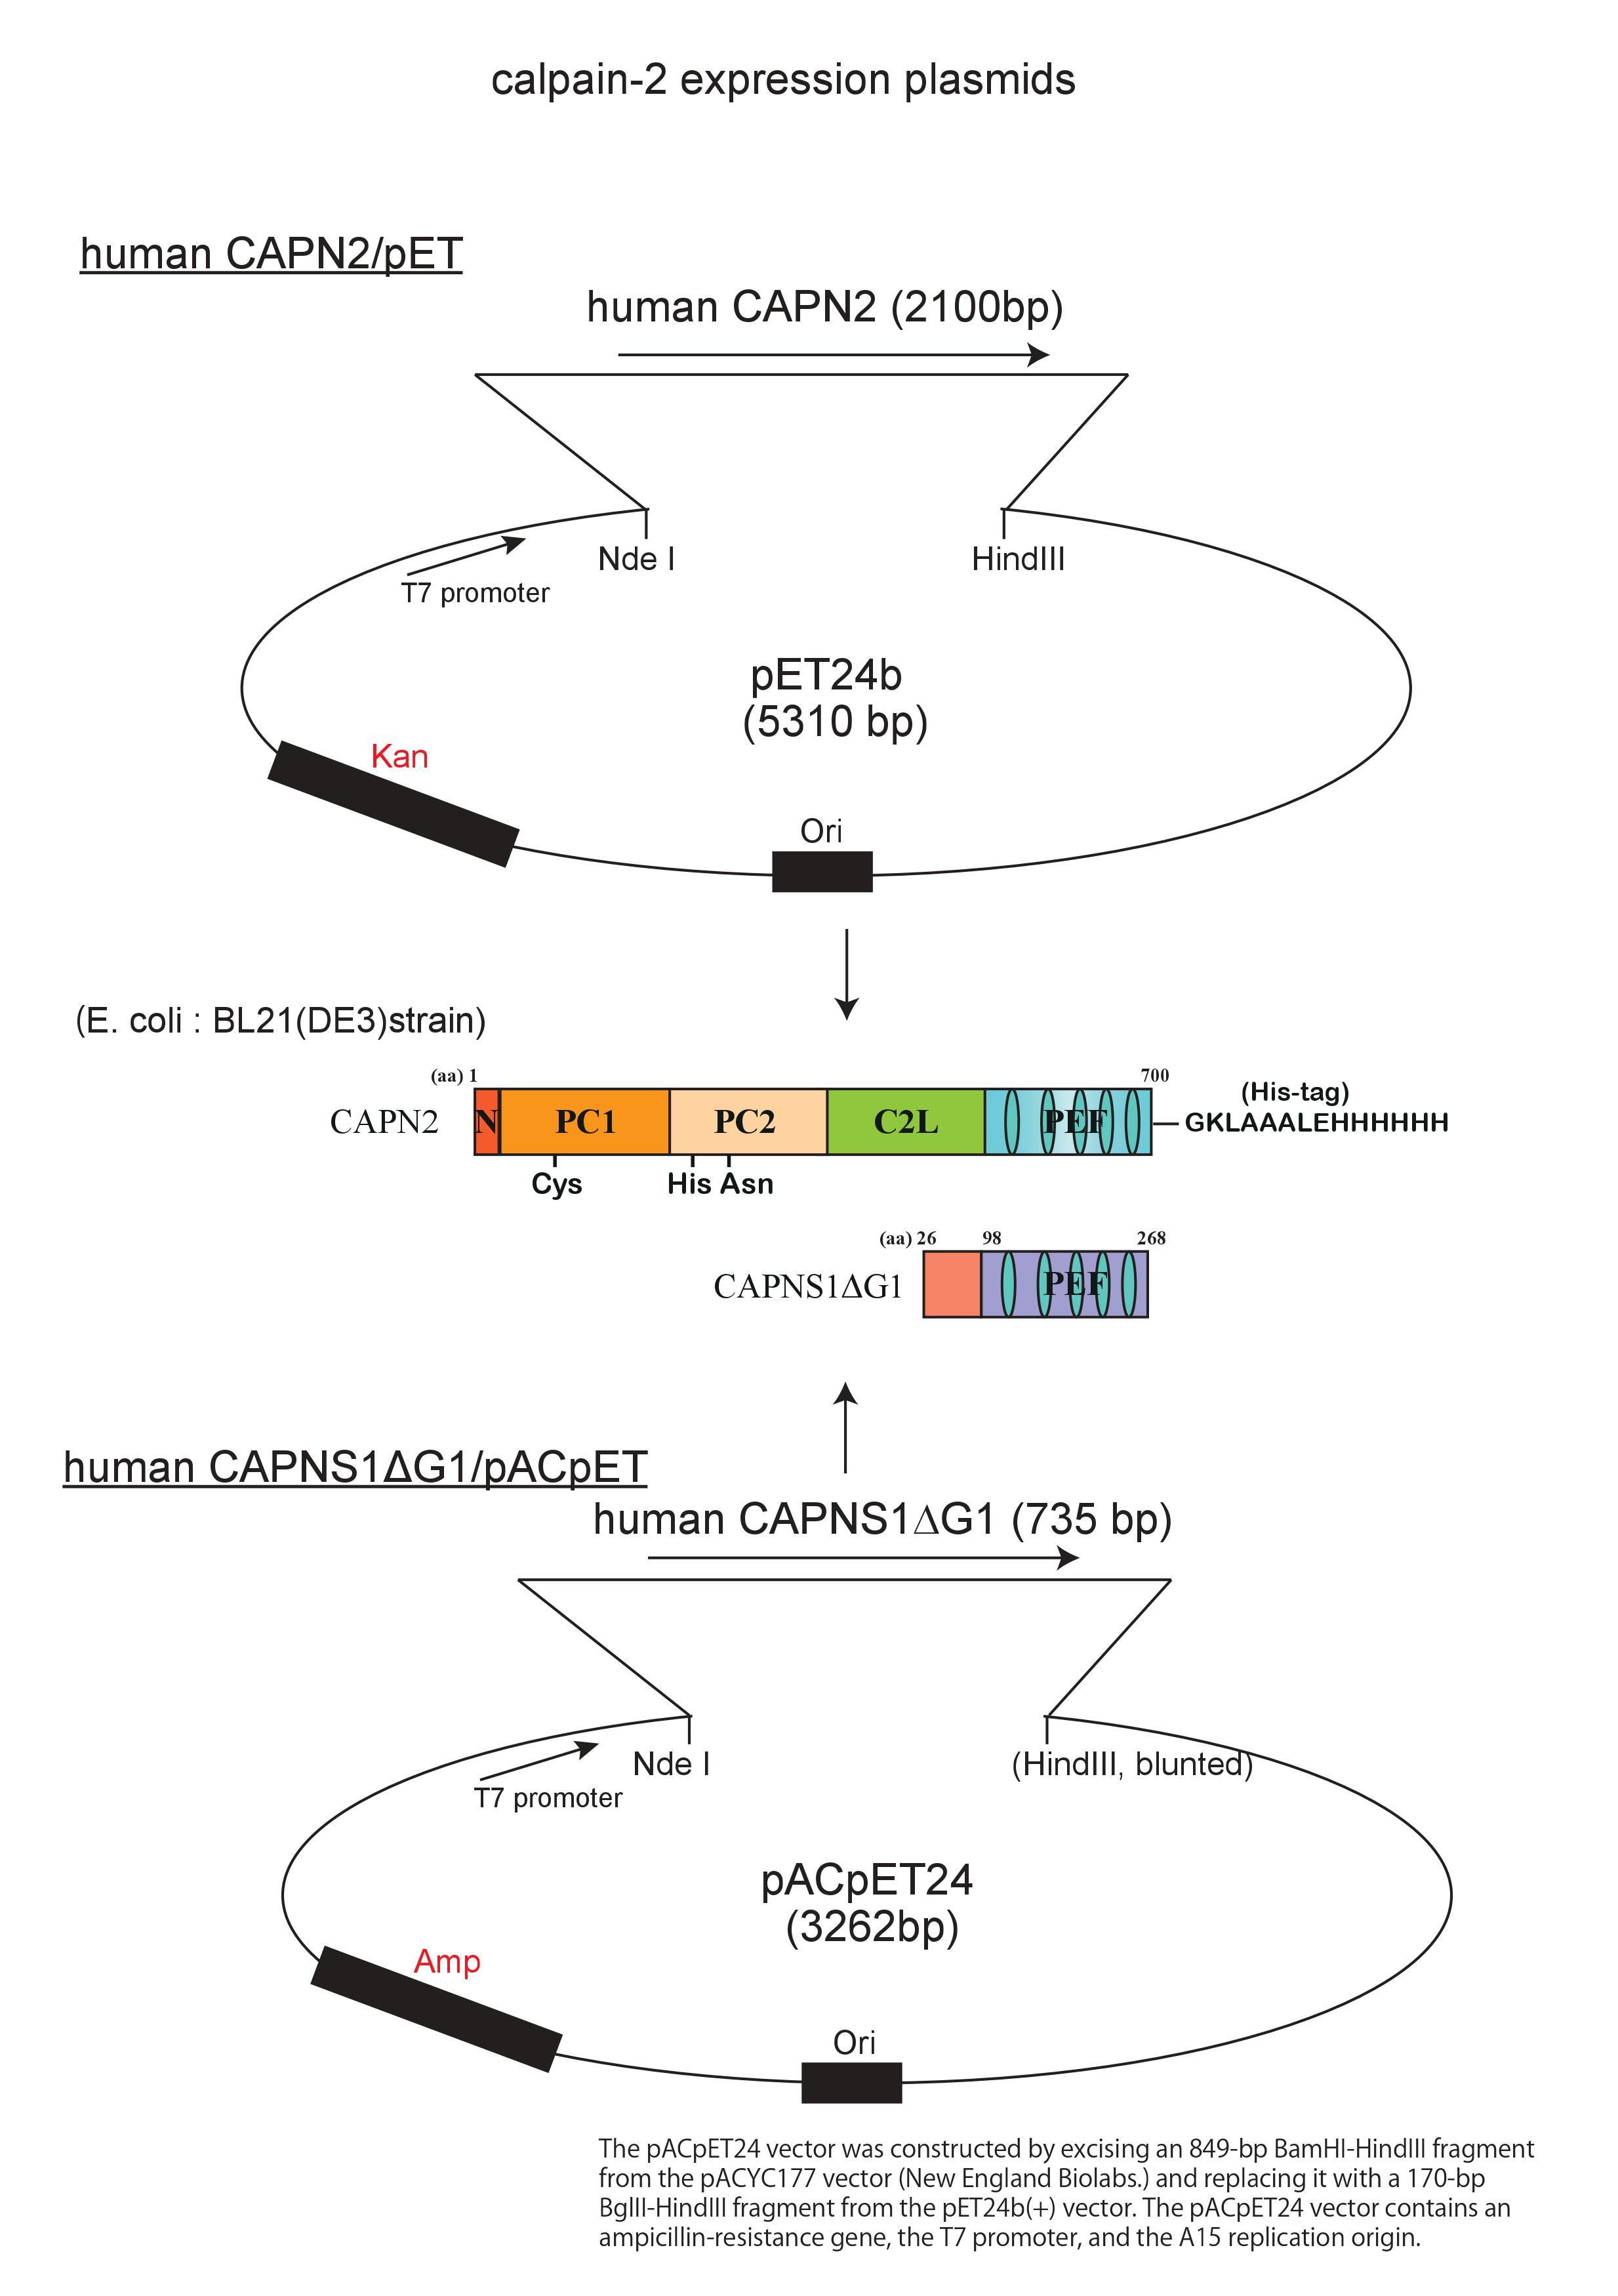 Plasmid maps